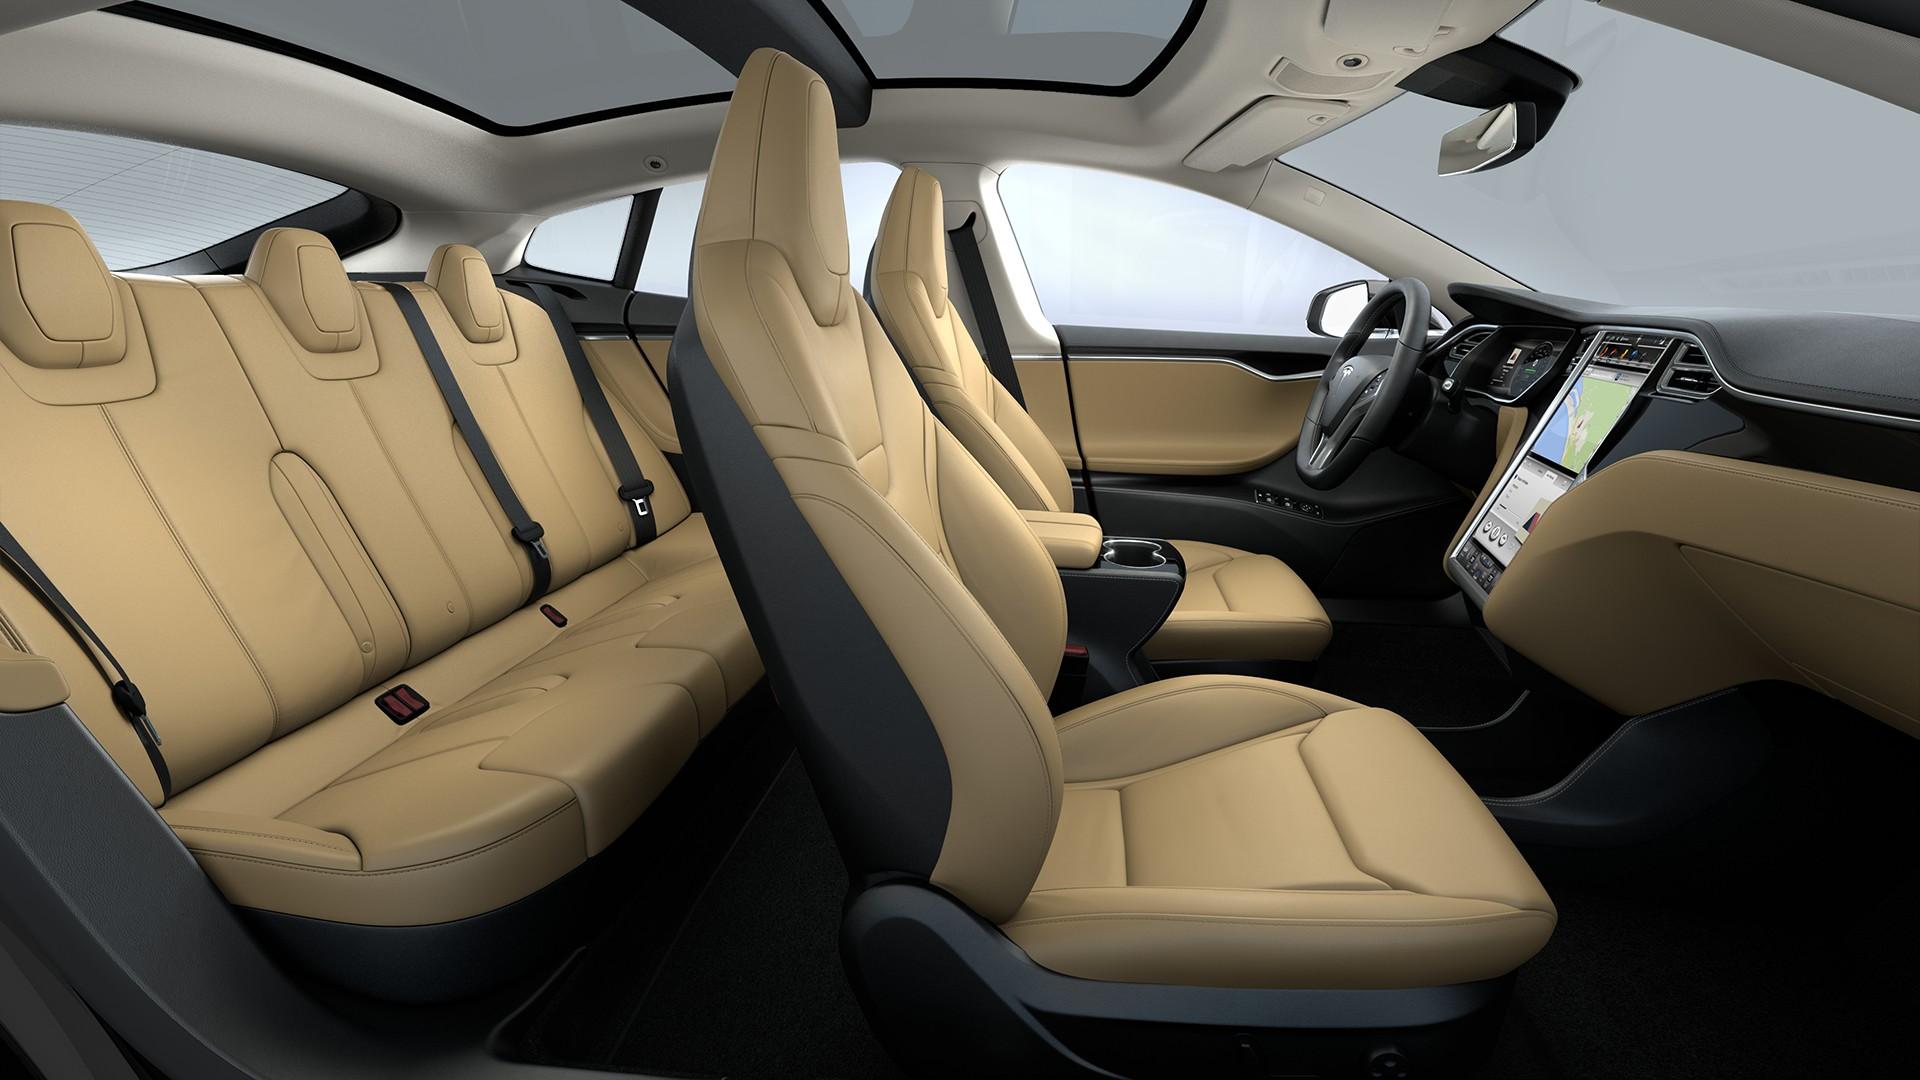 Interieur Matte Obeche Wood Decor Tan Next Generation Seats Standard Textile Headliner